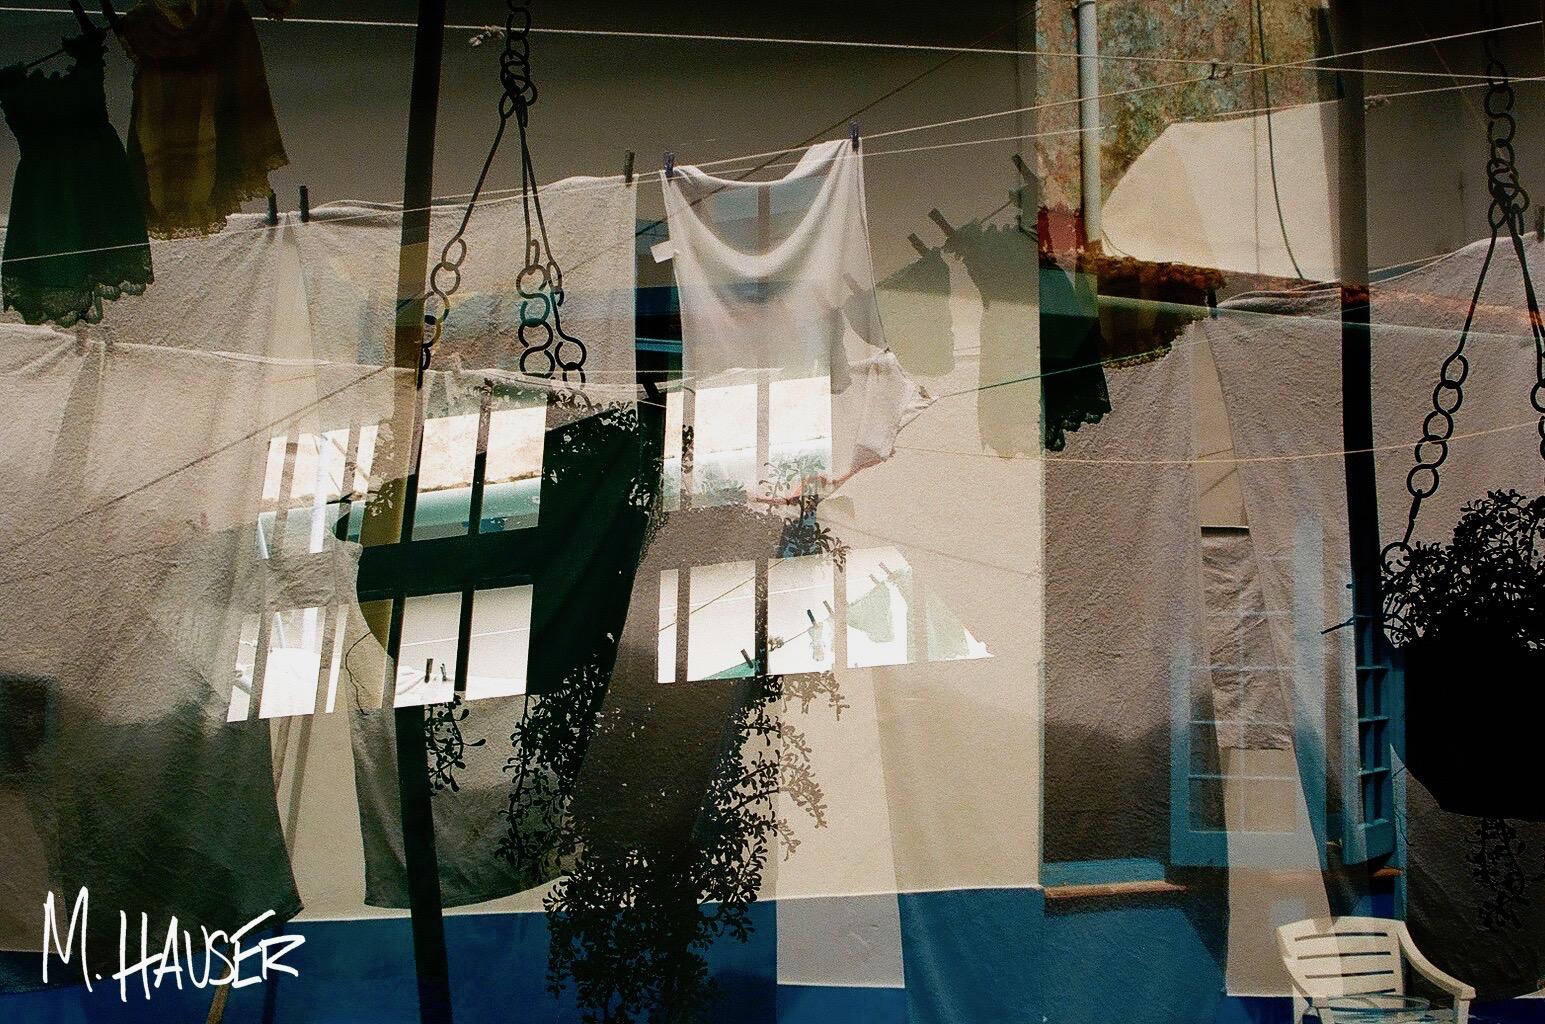 hang to dry. Cuba 2017